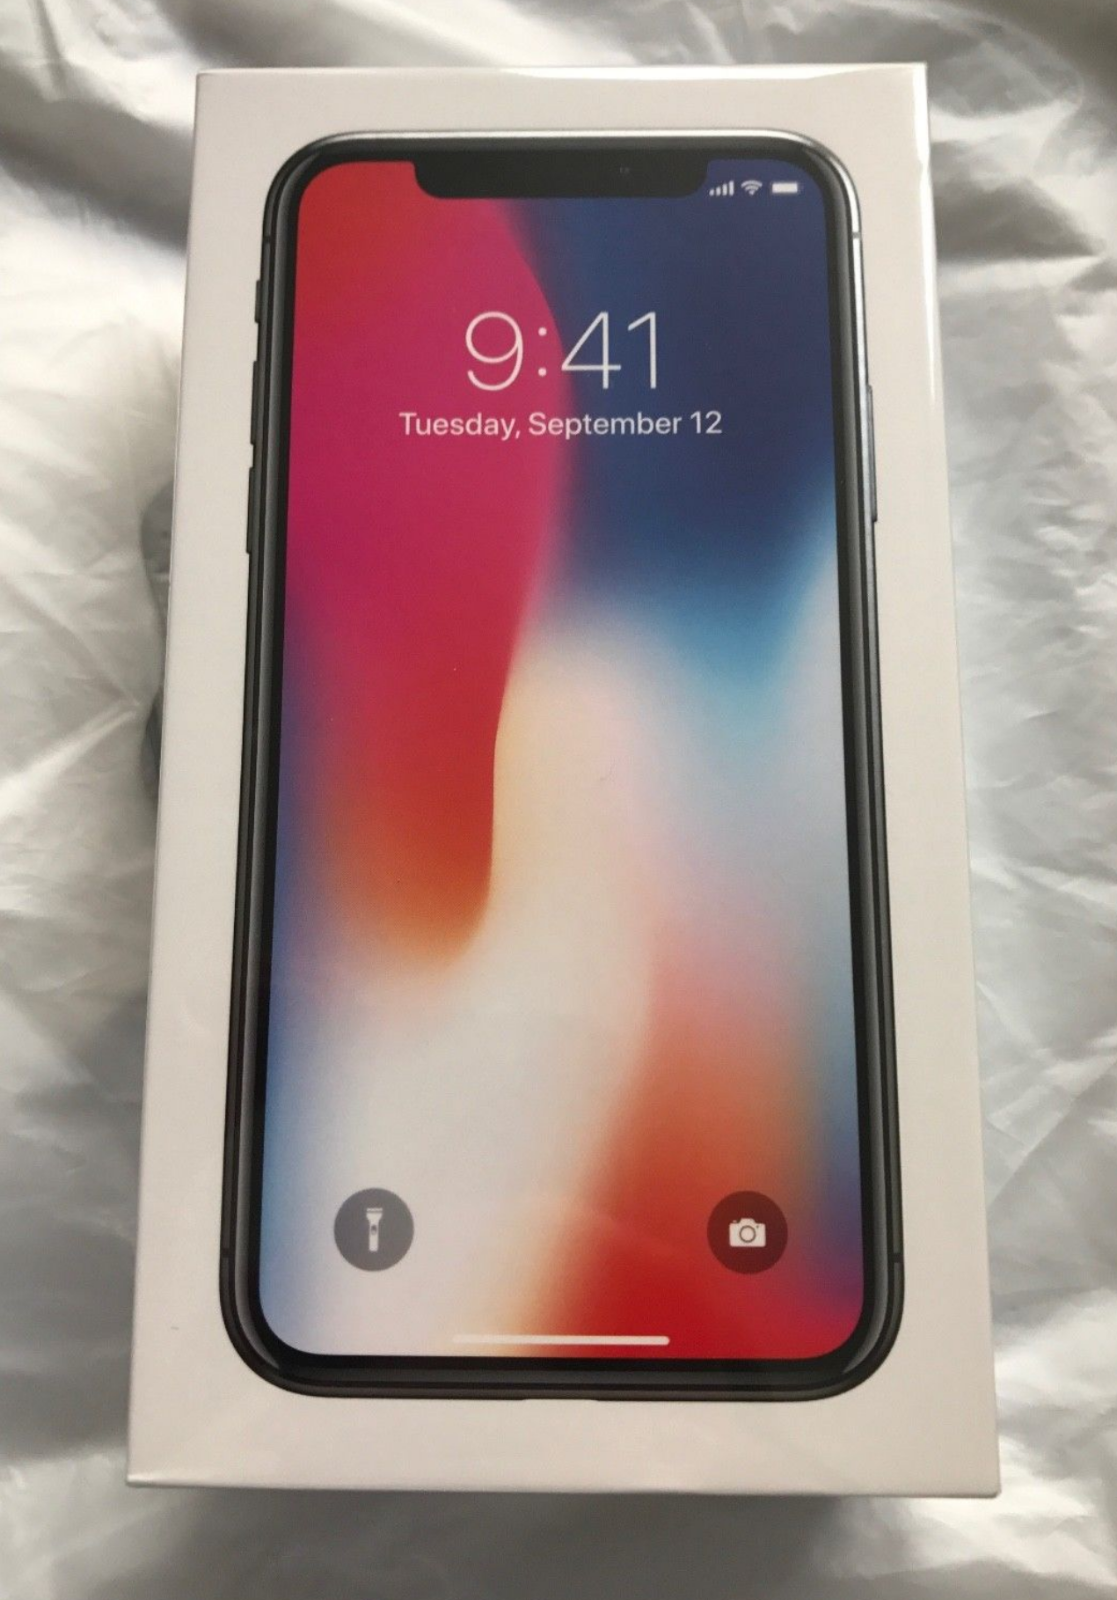 Apple Iphone X 64GB Spacegrau Ohne Simlock NEU & Verschweisst & Rechnung